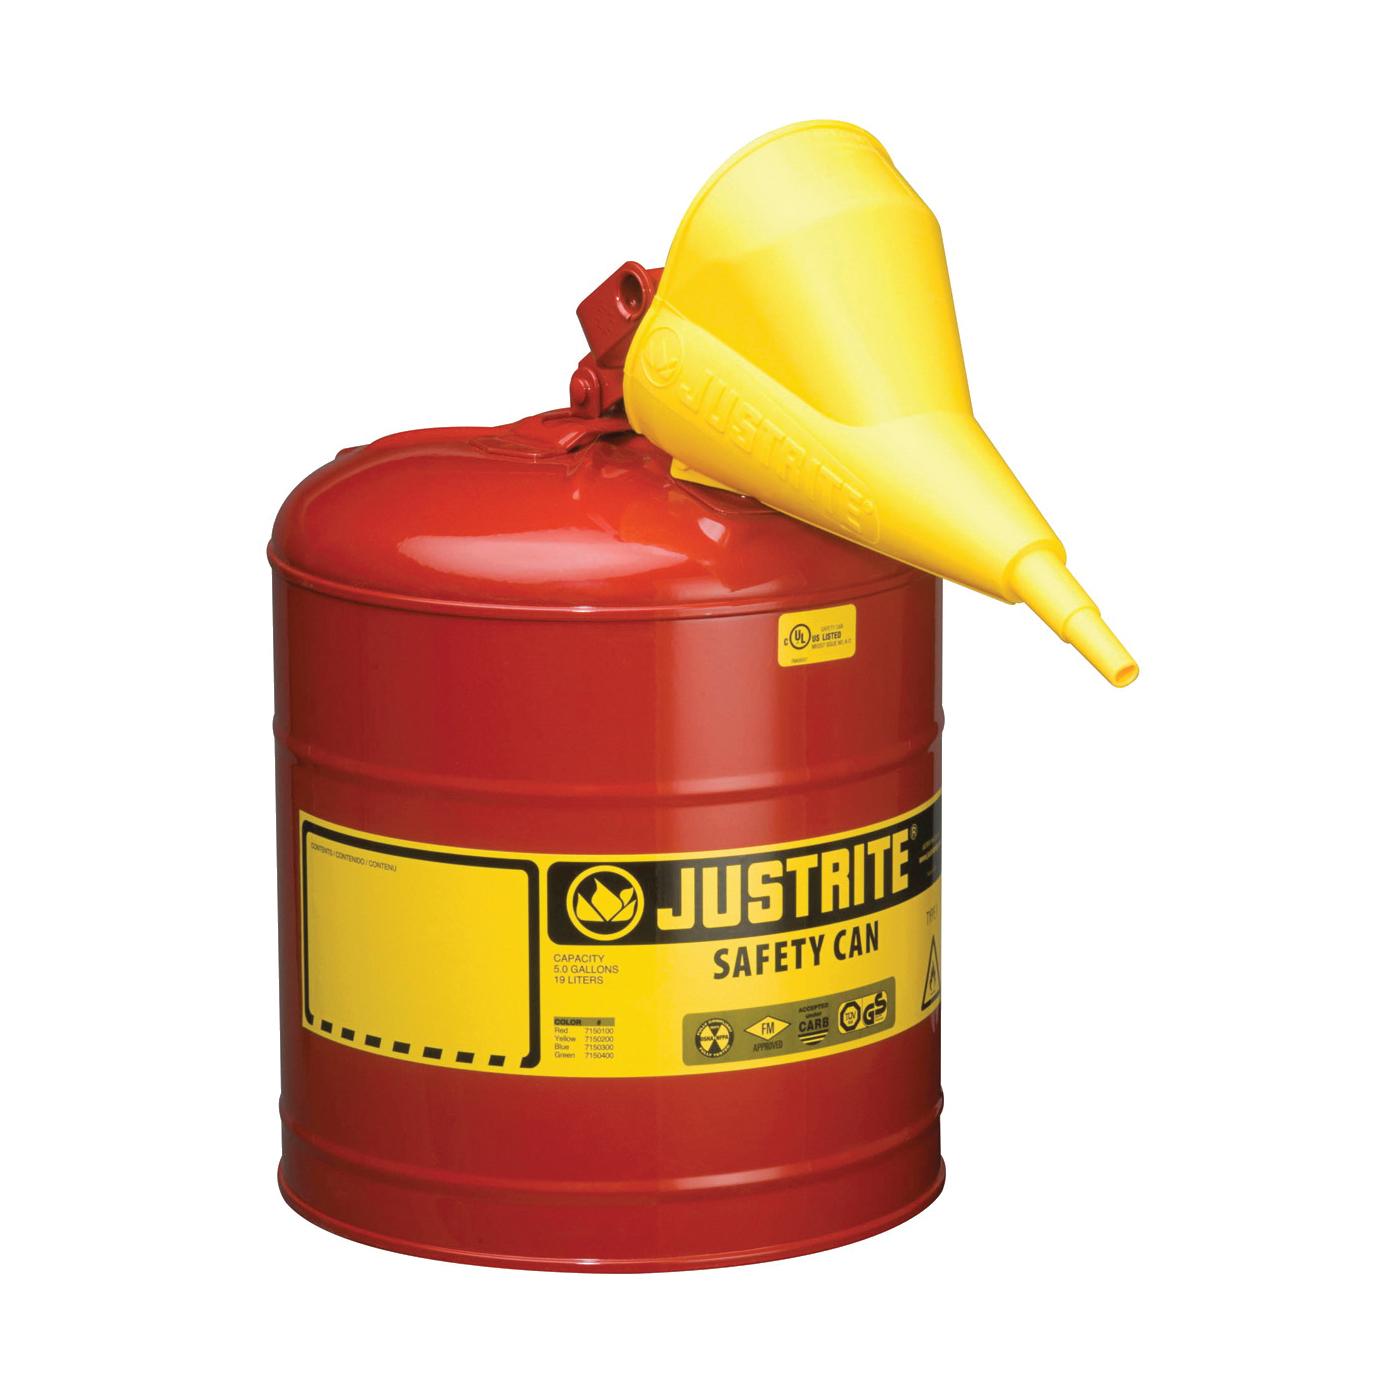 JUSTRITE 7150110